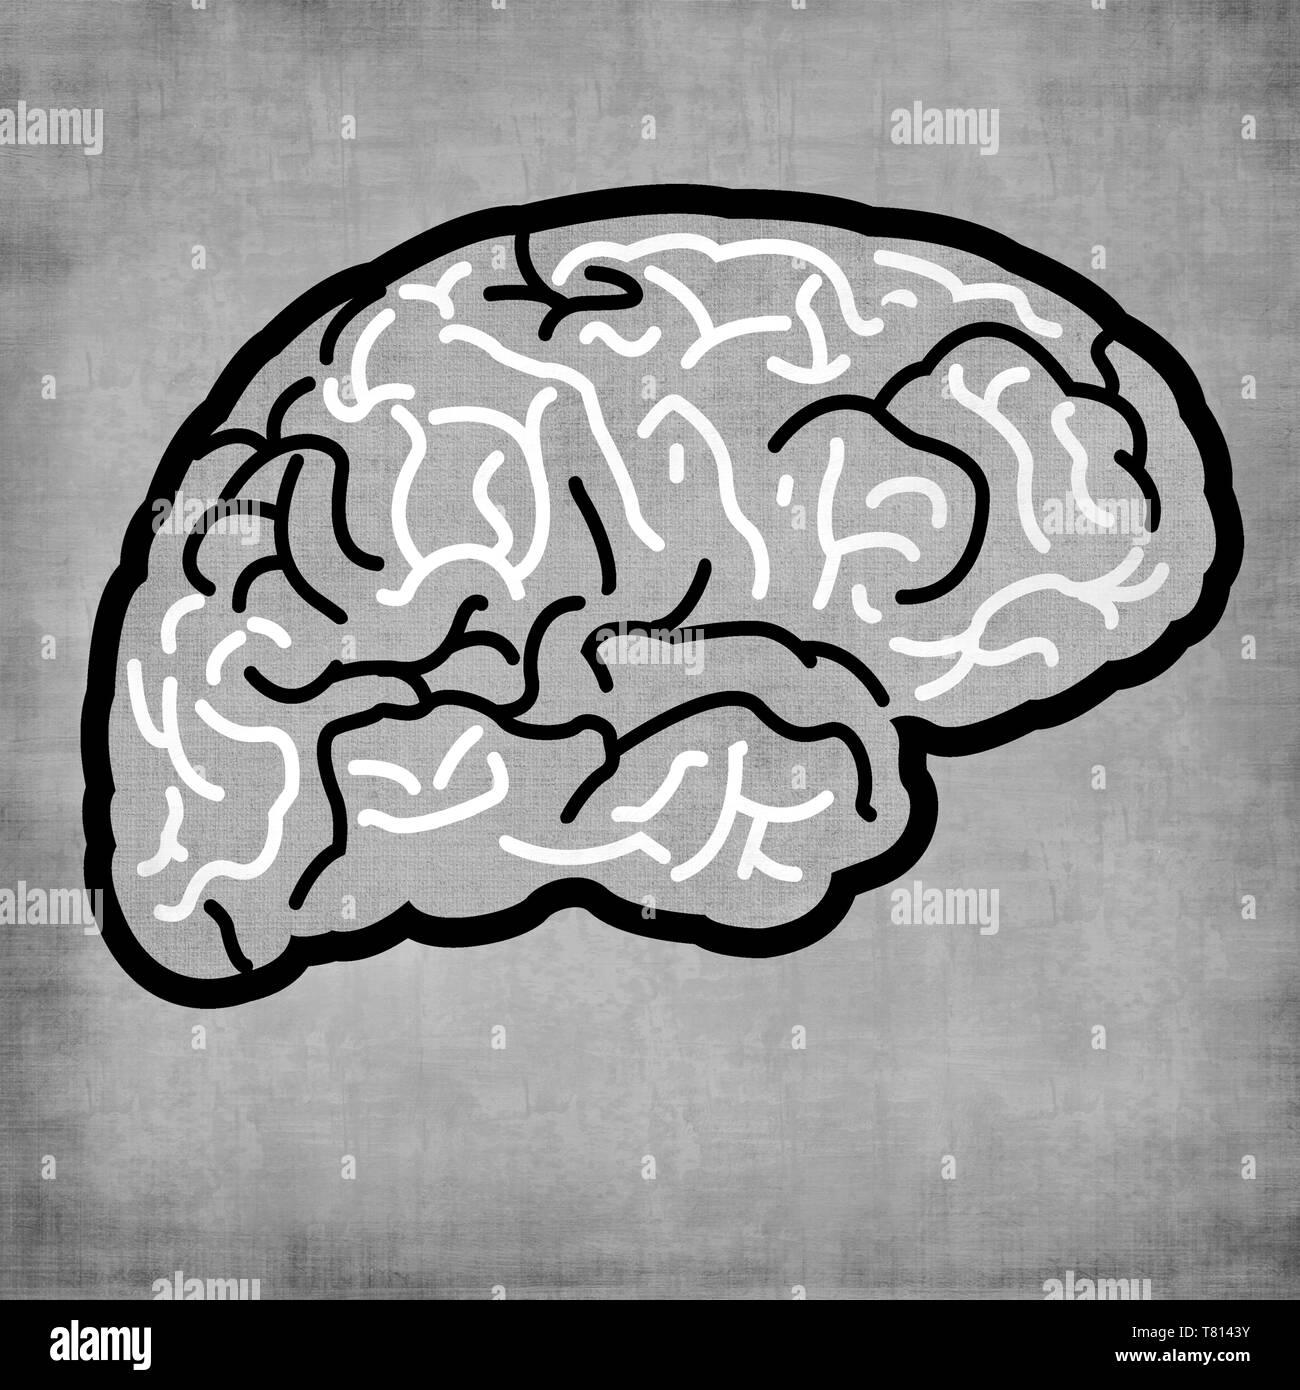 icon of brain - Stock Image